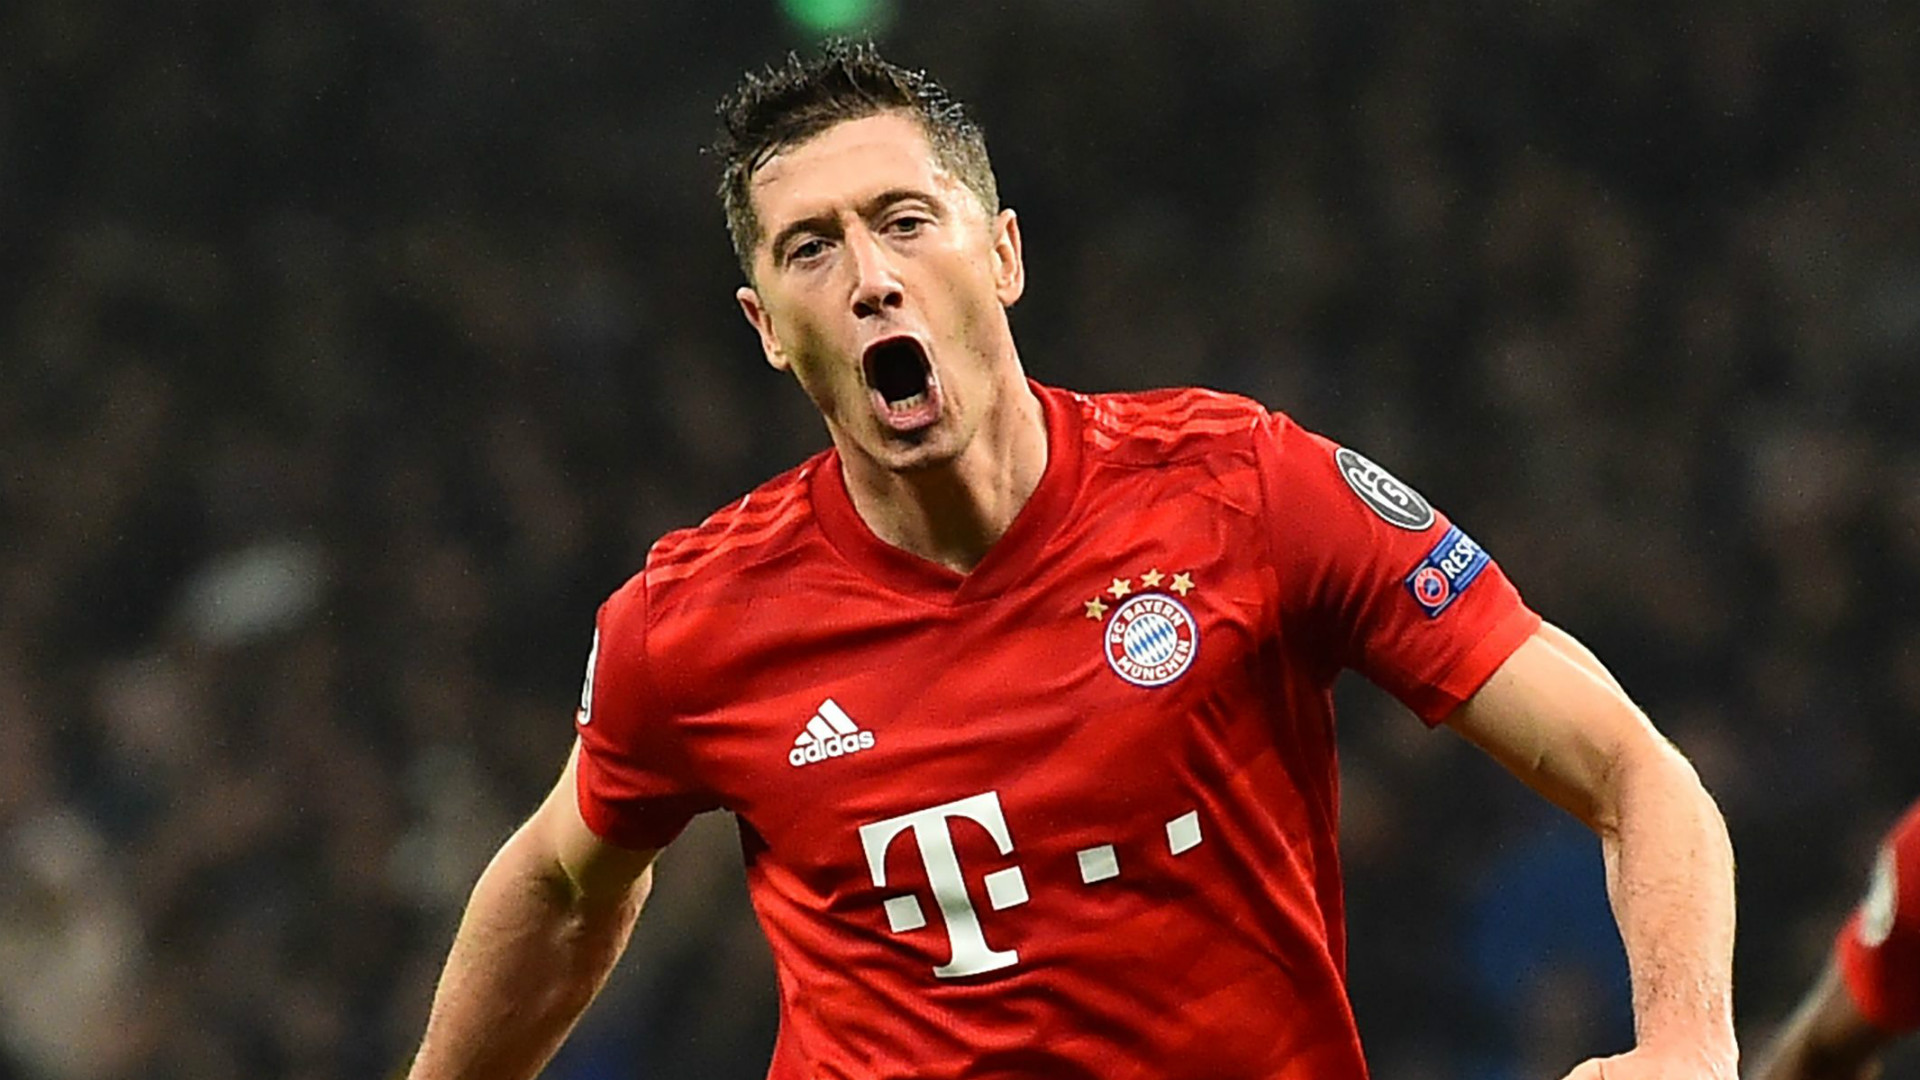 Former Bayern Munich star Elber: I told Lewandowski he is even better than me!